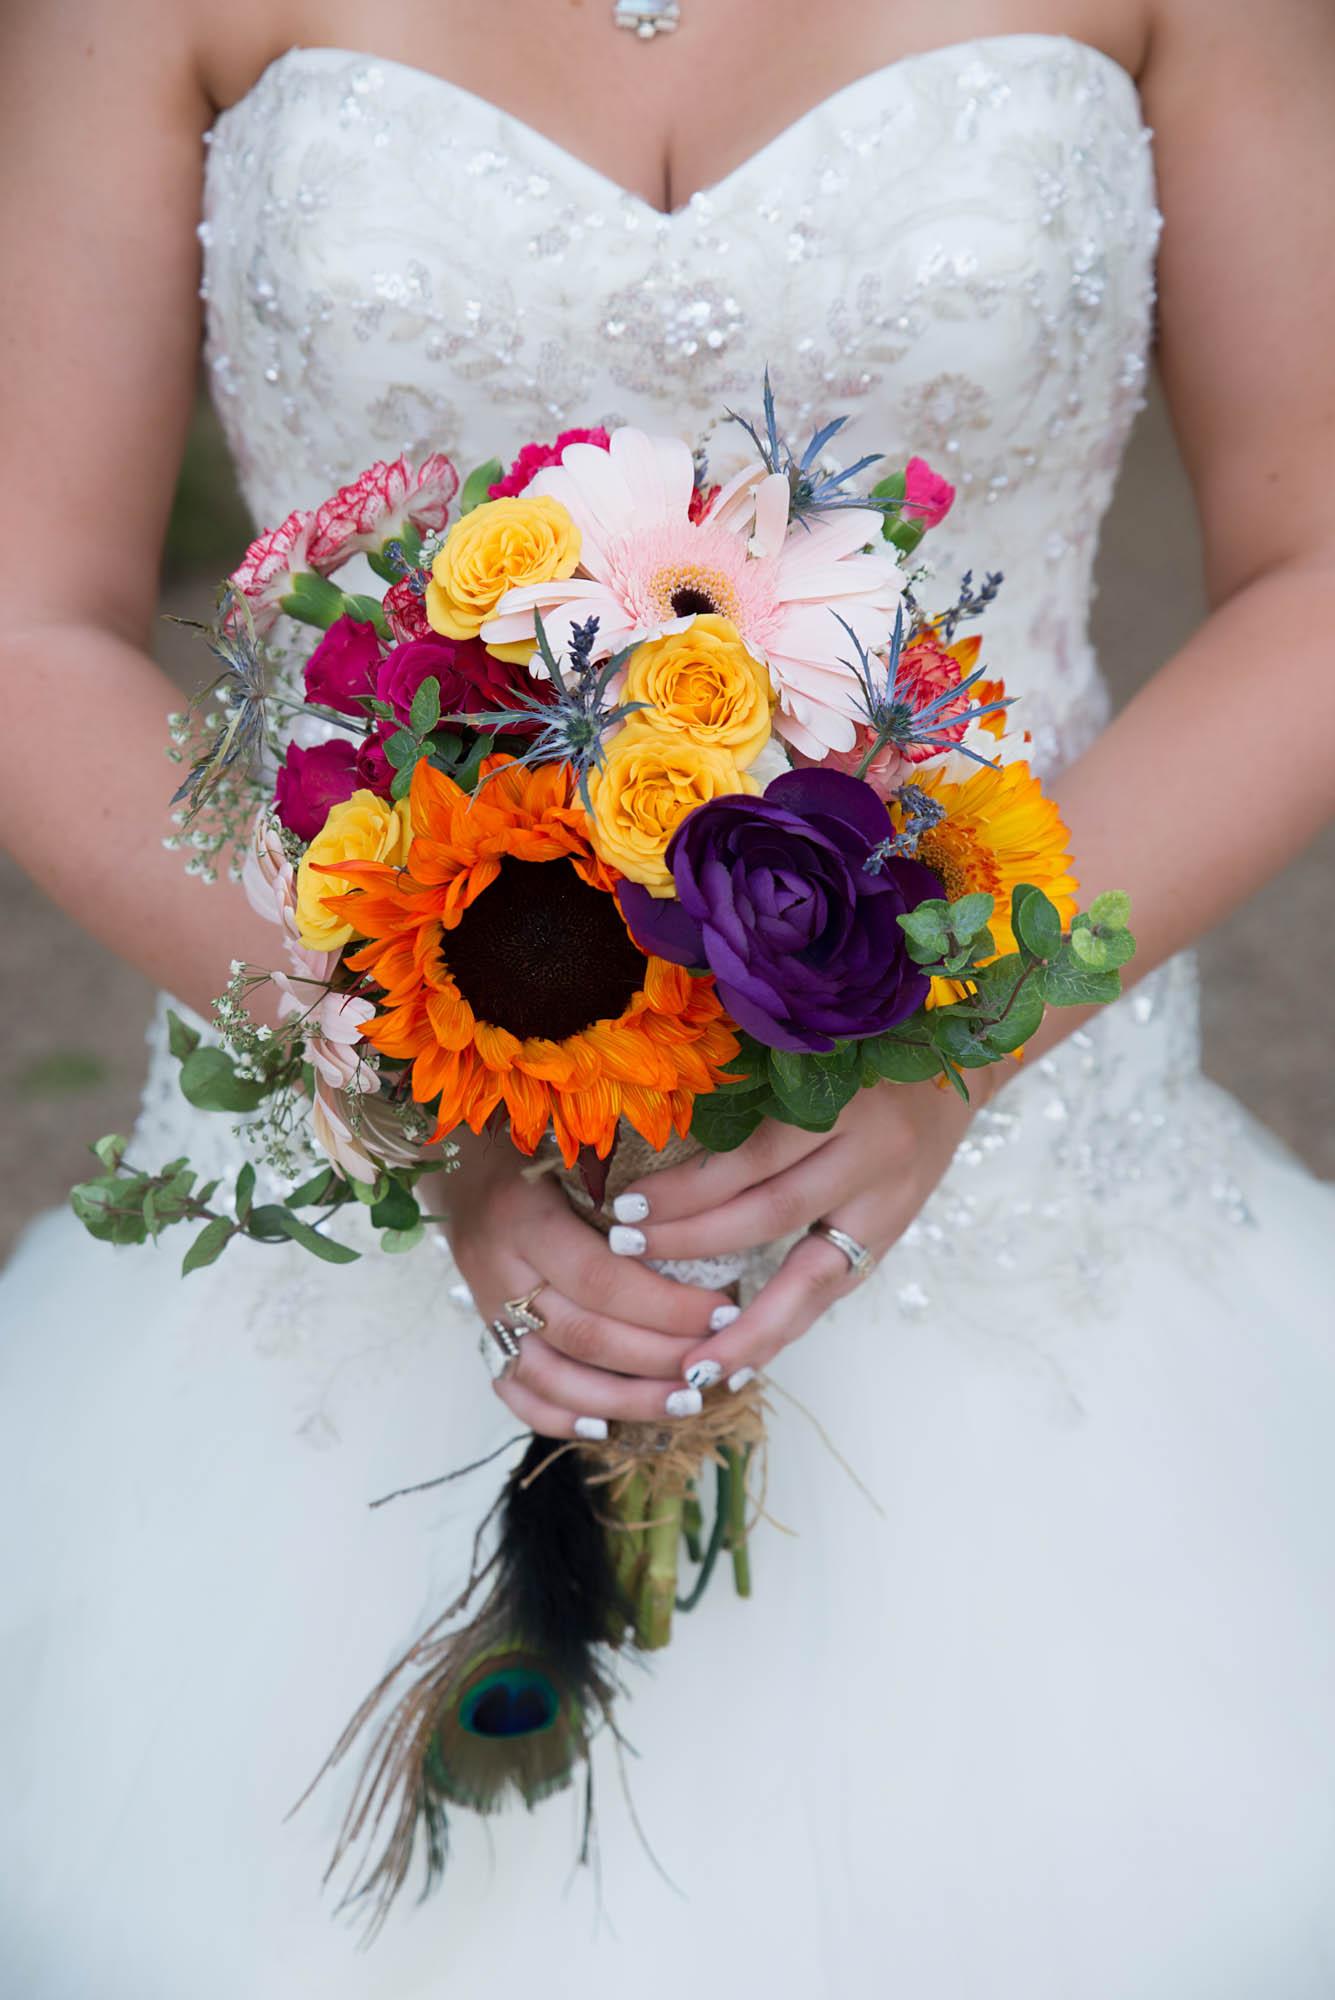 Stephanie Ray Wedding PhotographyDSC_3889w.jpg